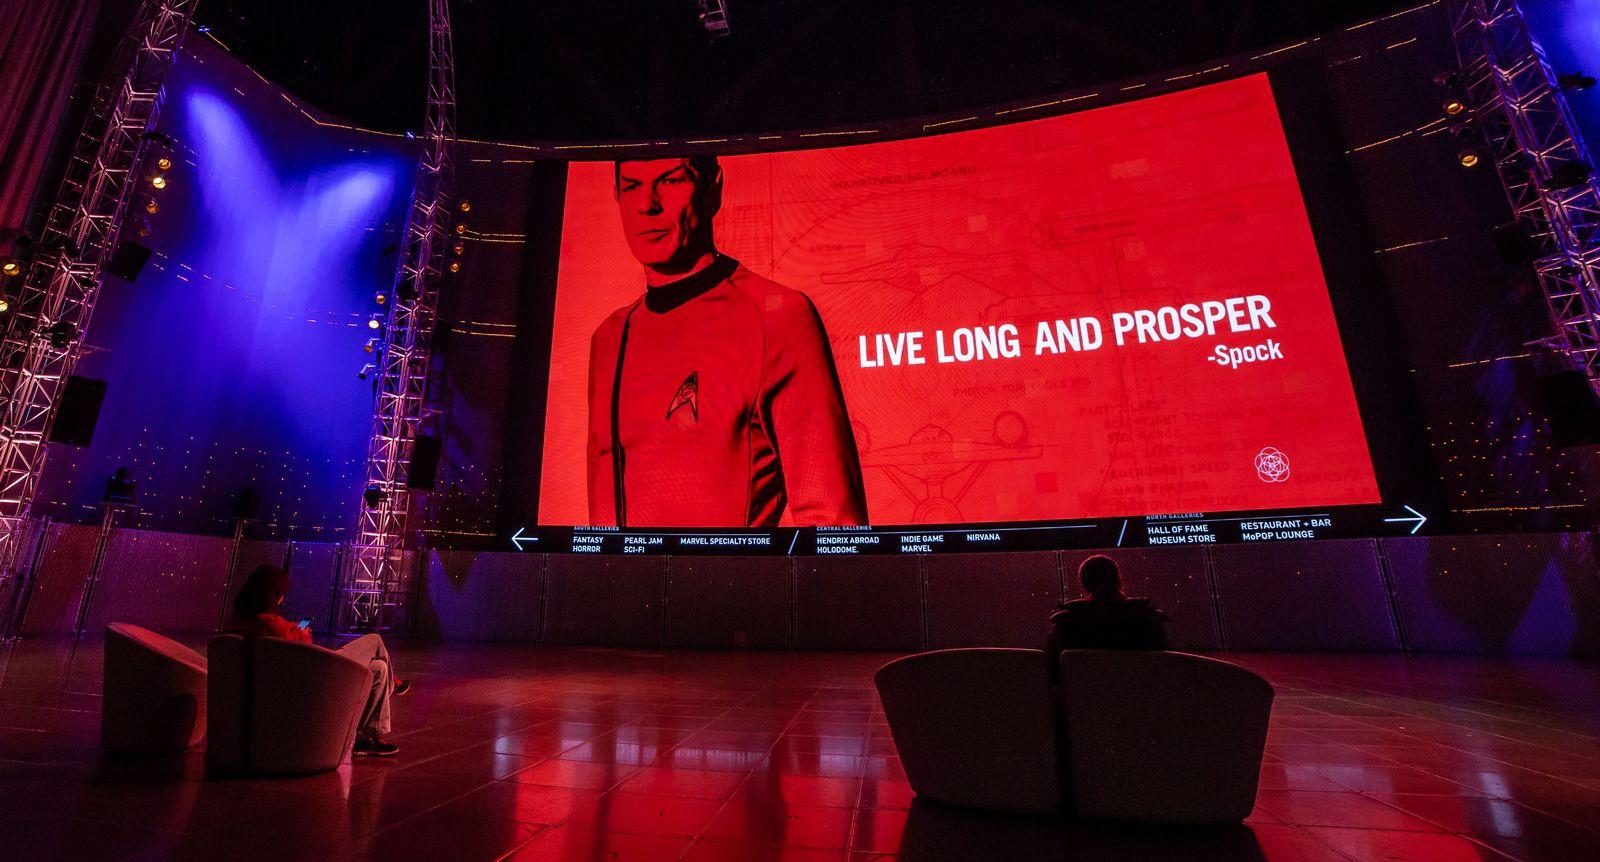 Un último mensaje de Spock